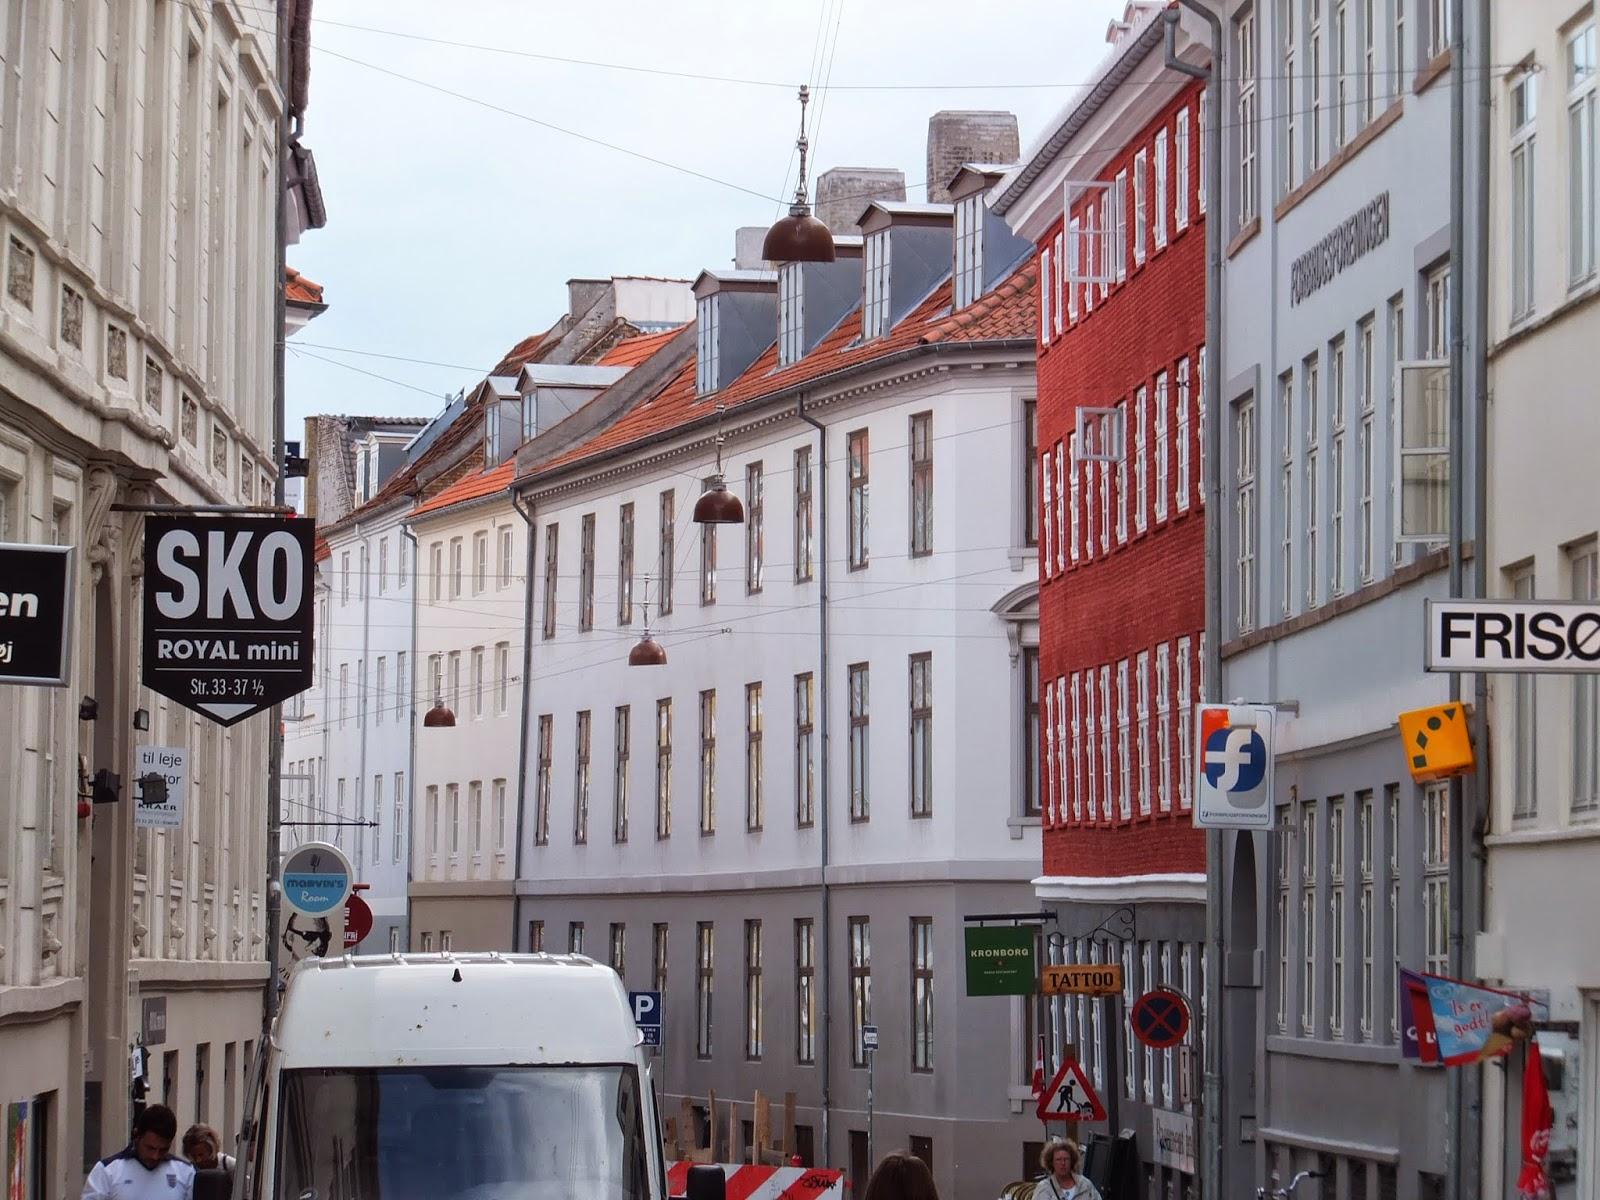 copenhagen-road コペンハーゲンの街中3